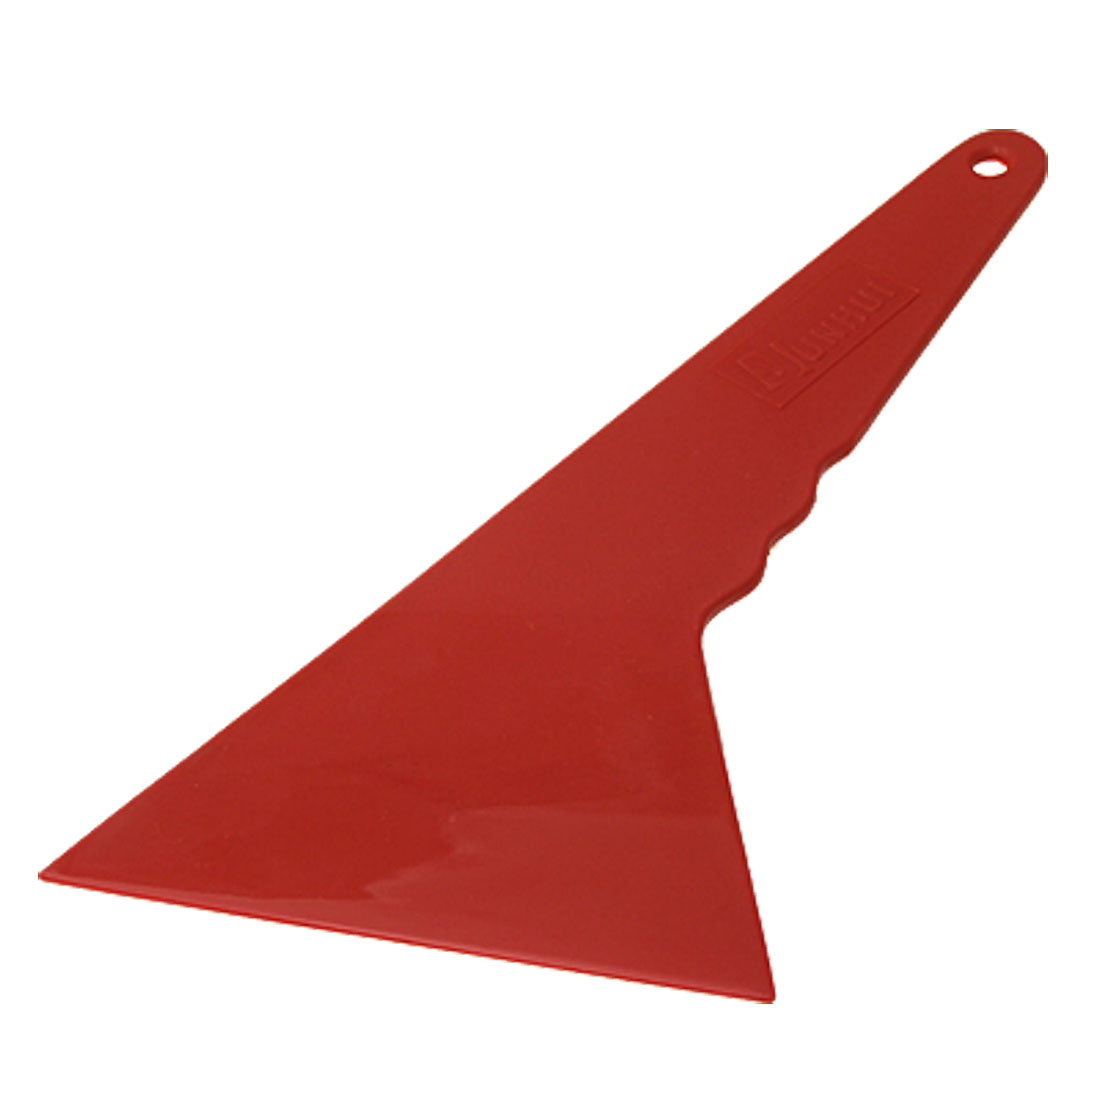 Red Plastic Car Window Flim Tint Bubble Cleaner Scraper Tool